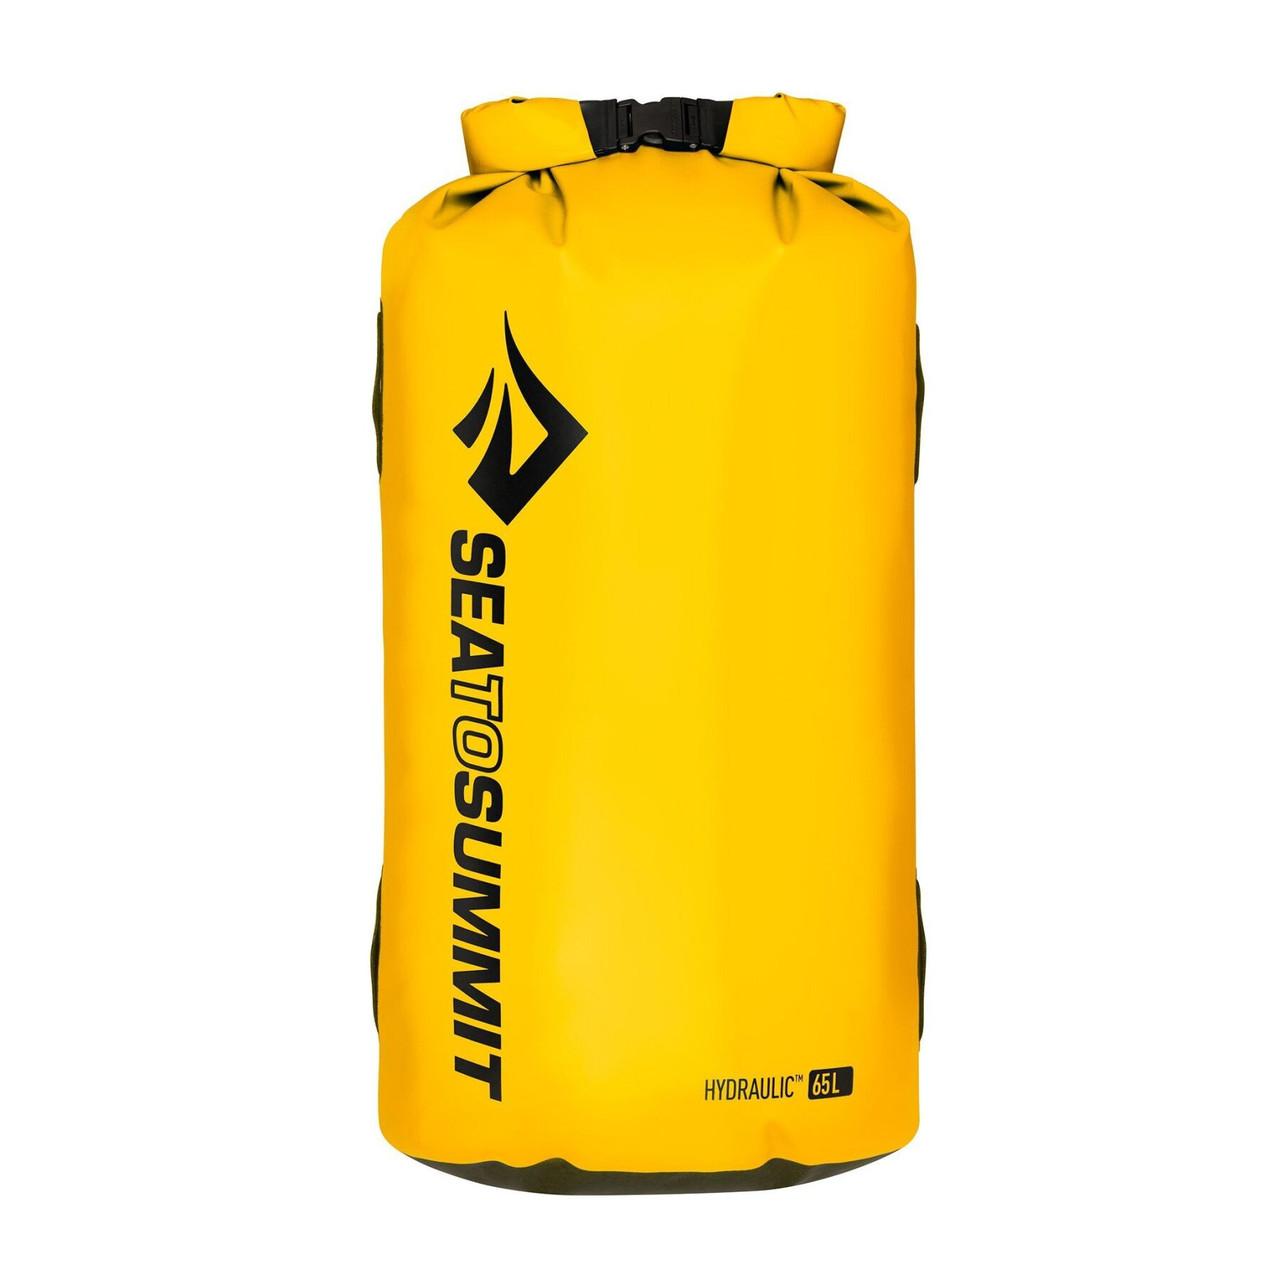 Гермомішок Sea To Summit Hydraulic Dry Bag 20 Yellow